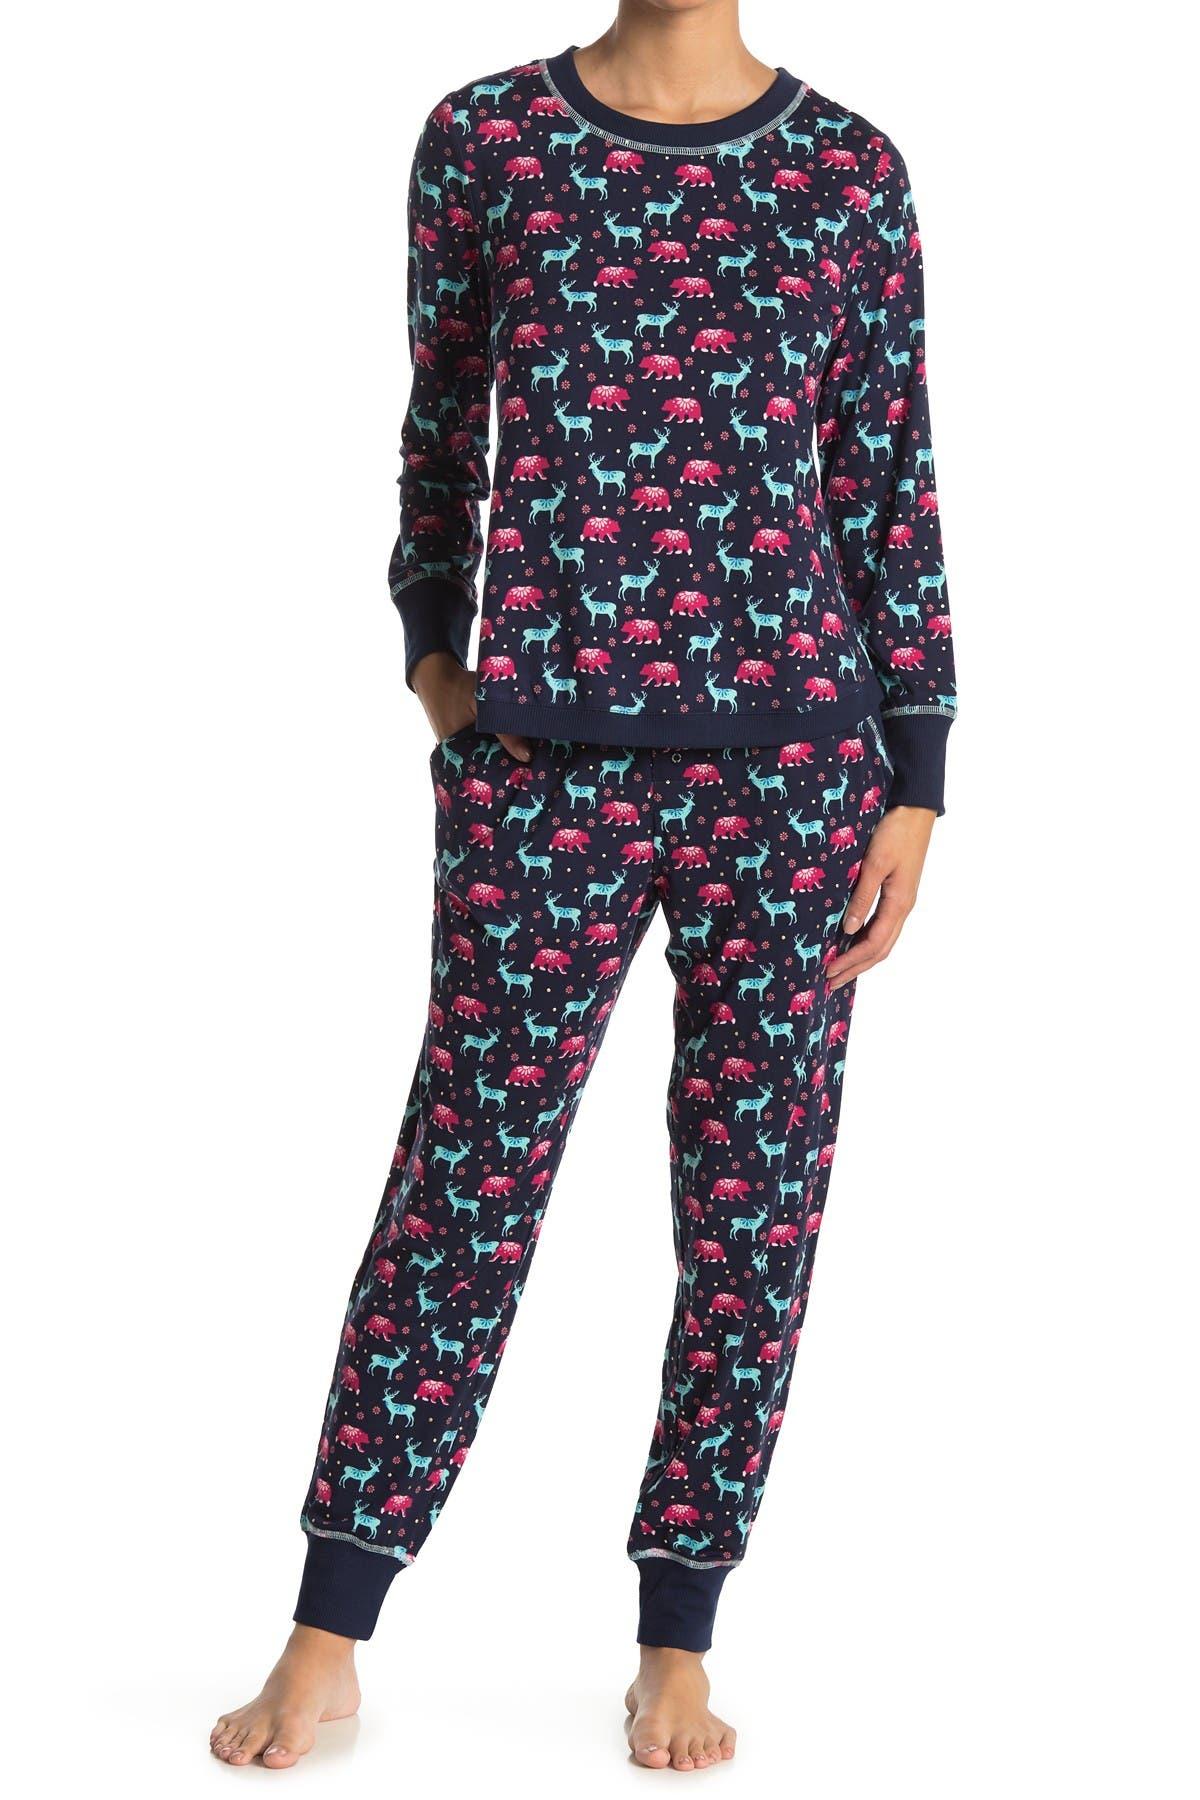 Image of Jane & Bleecker New York Long Sleeve Top & Joggers 2-Piece Pajama Set